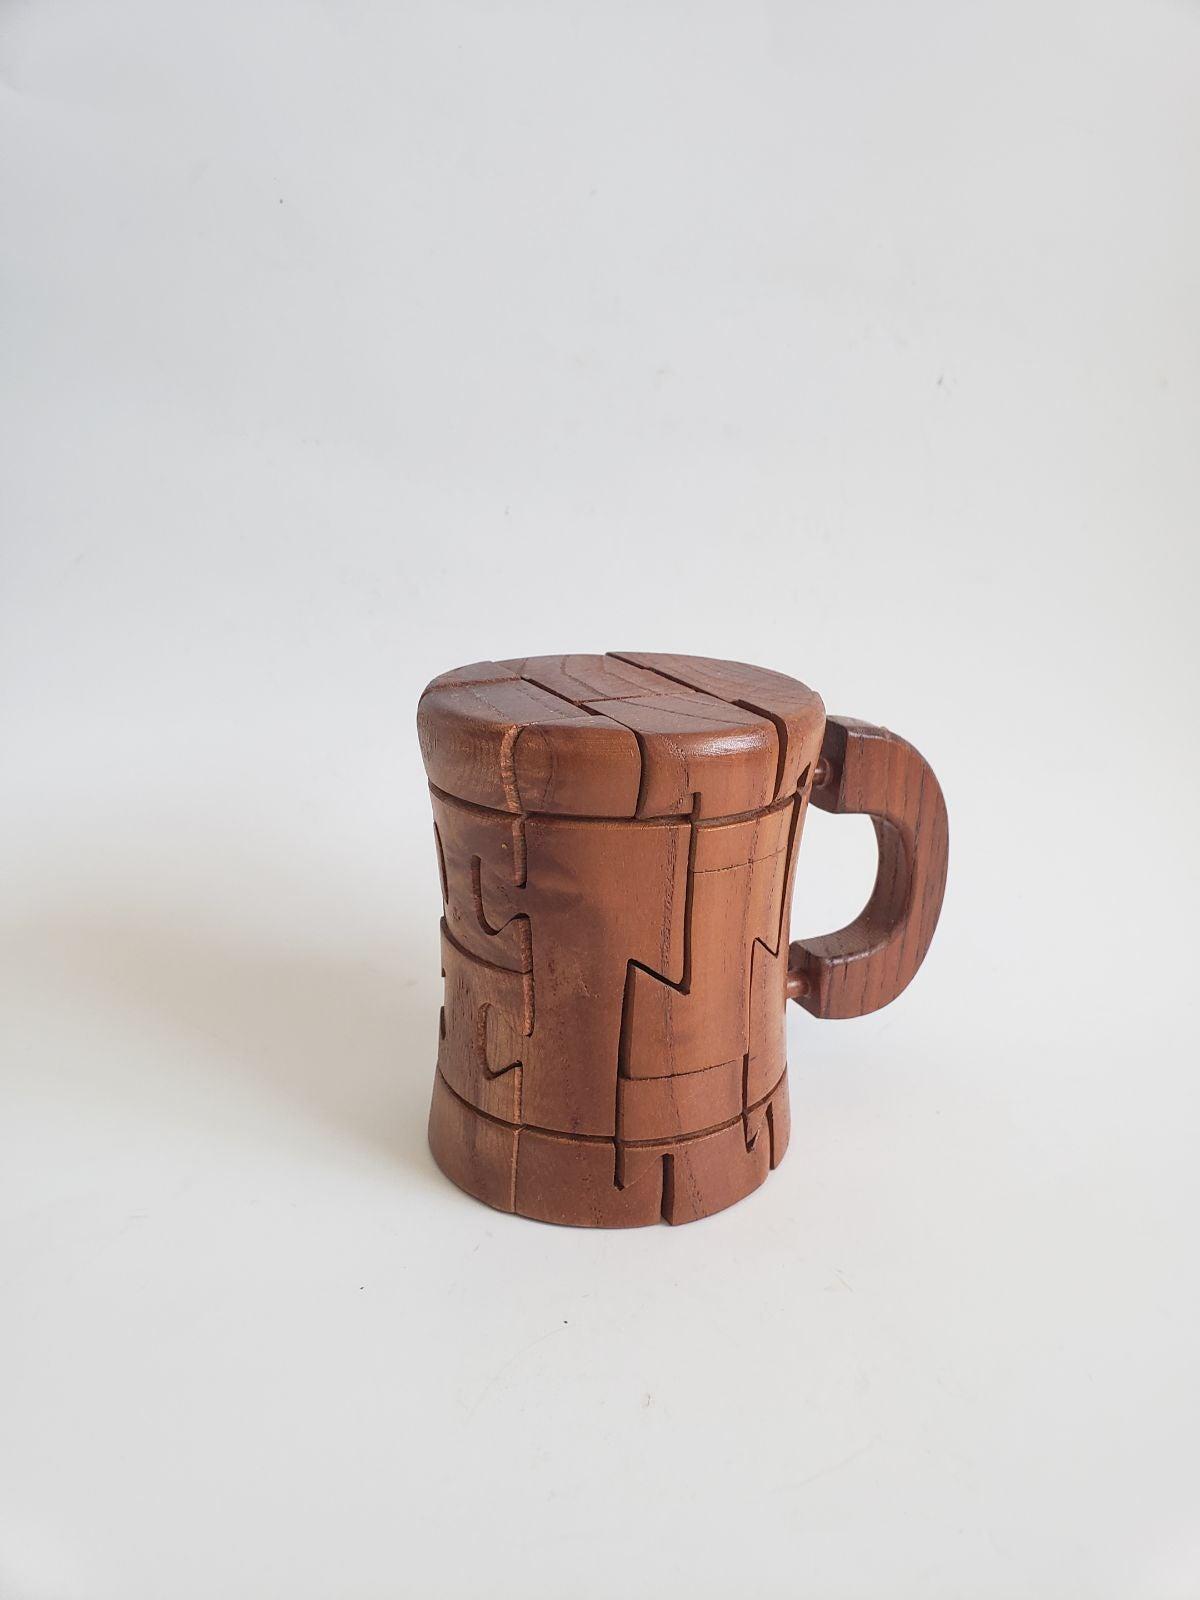 Wooden Puzle Beer Mug